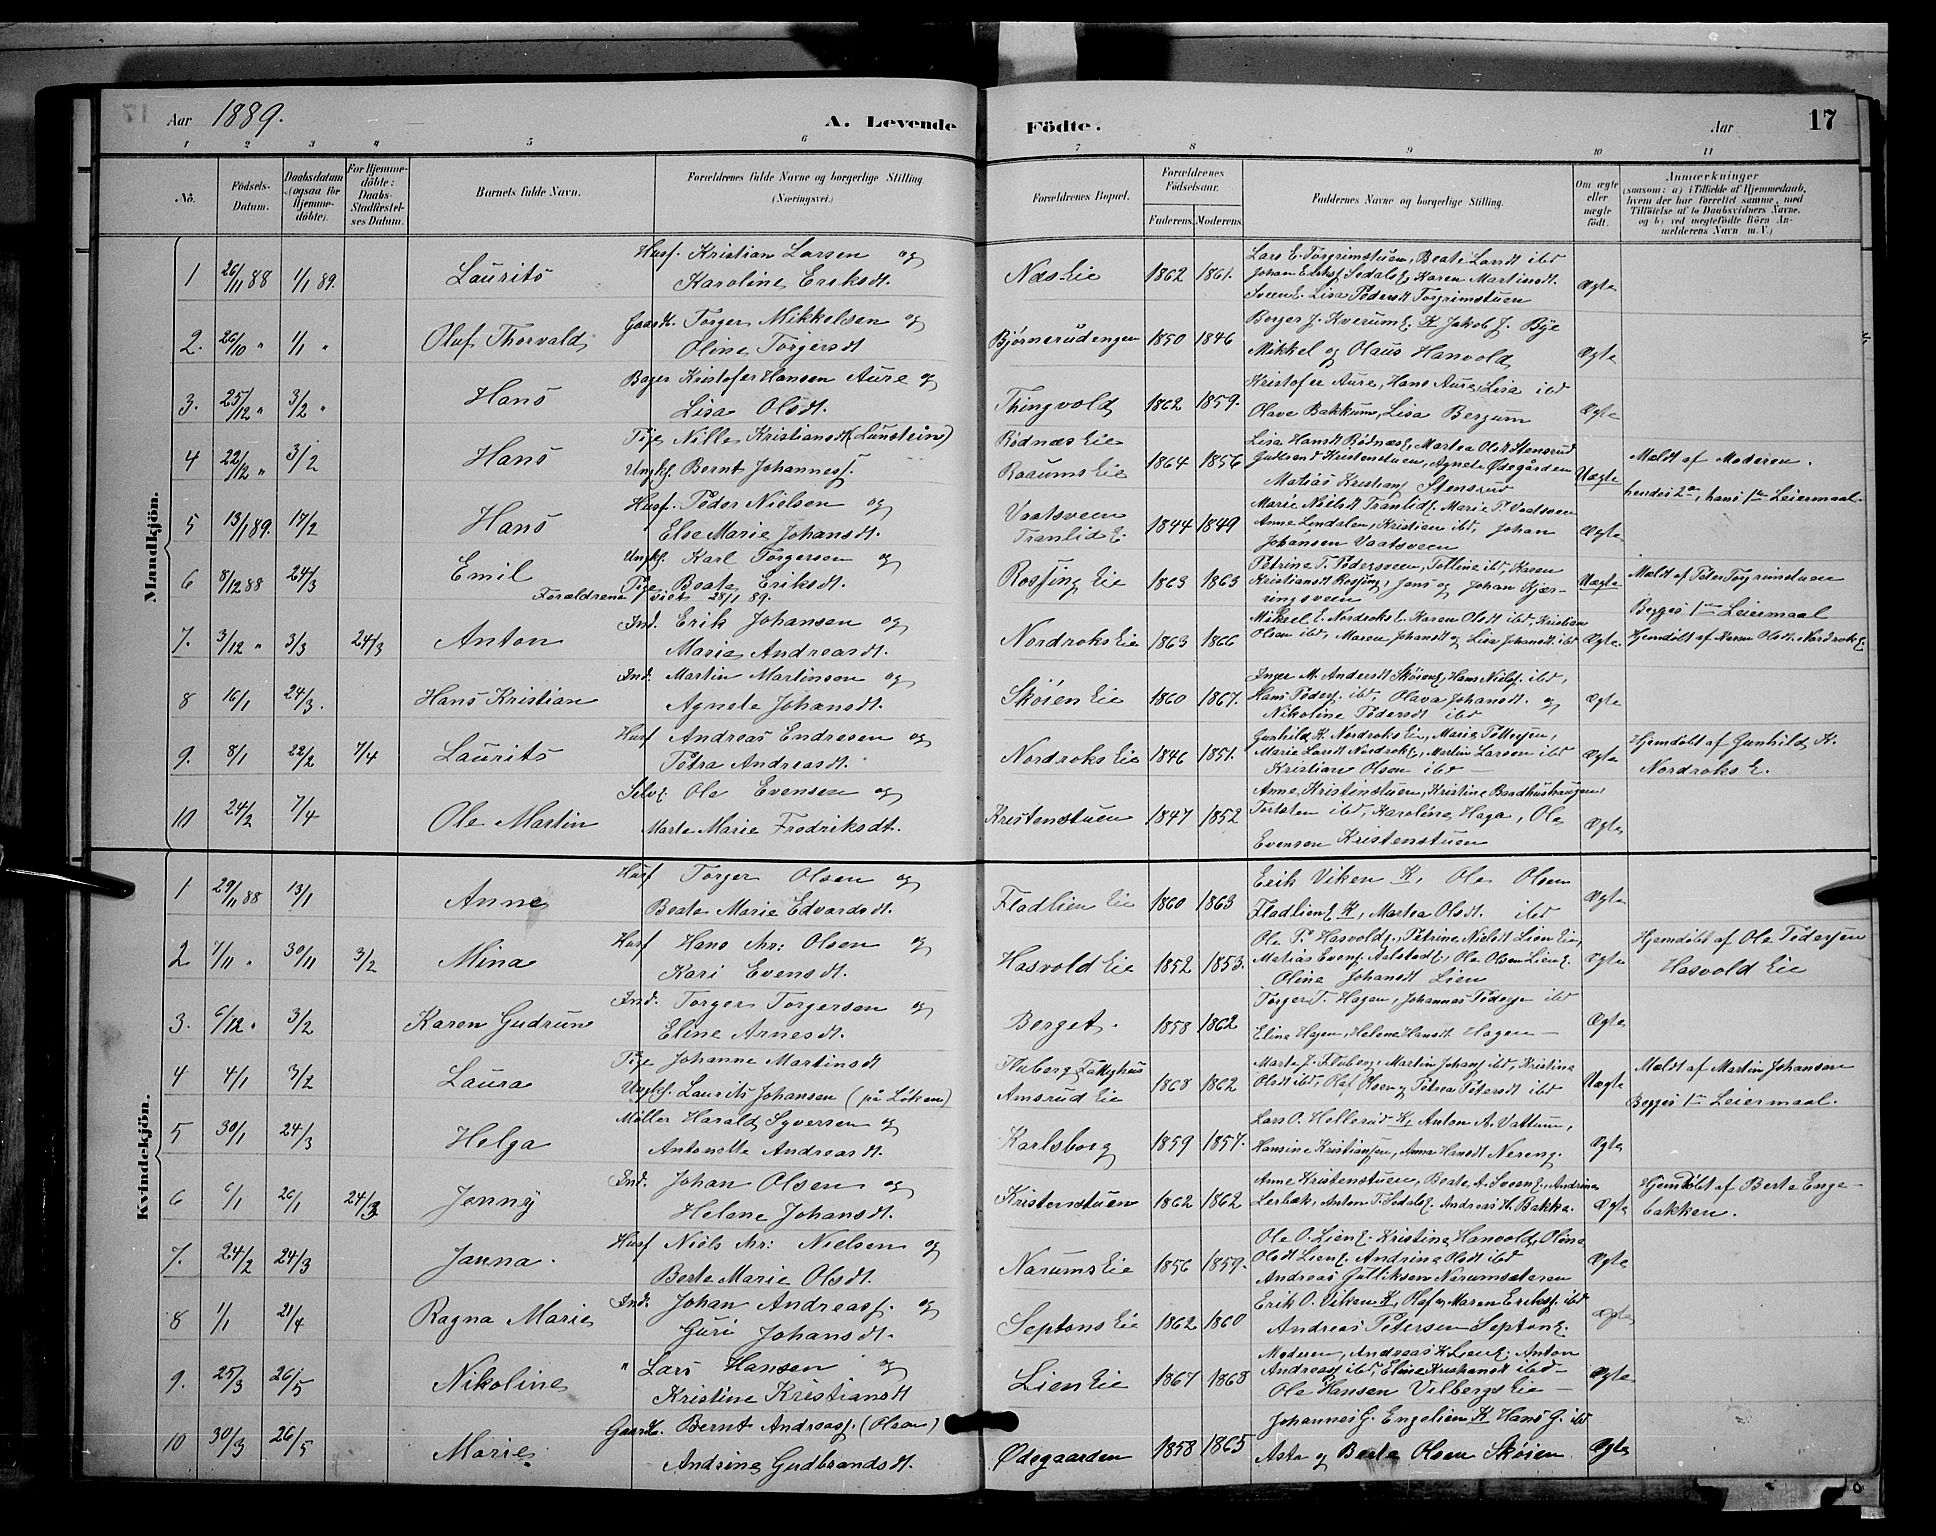 SAH, Søndre Land prestekontor, L/L0003: Klokkerbok nr. 3, 1884-1902, s. 17